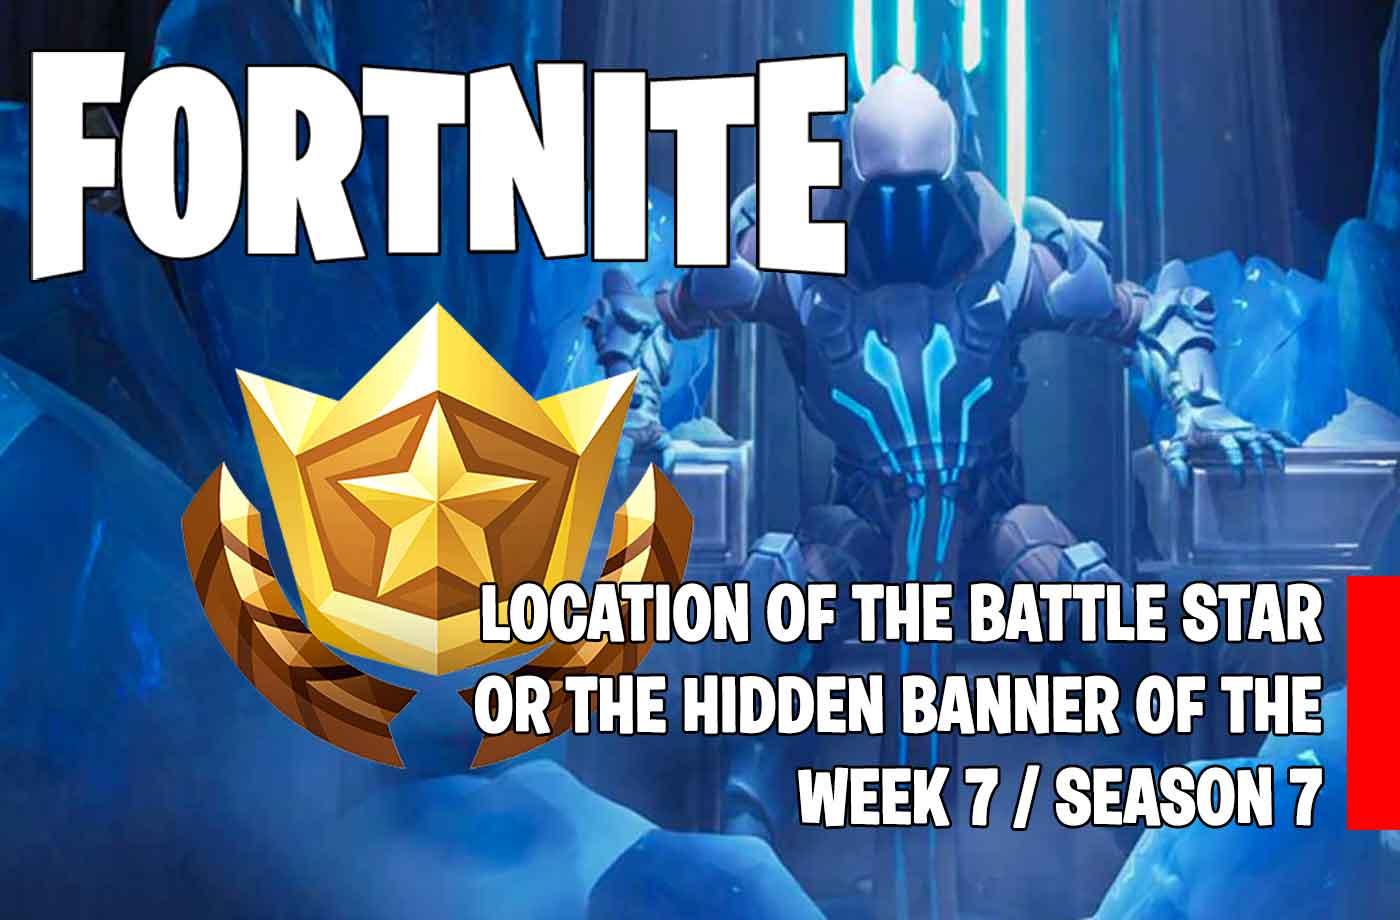 guide fortnite season 7 where the hidden battle star of week 7 is located snowfall challenge - fortnite week 8 loading screen 7